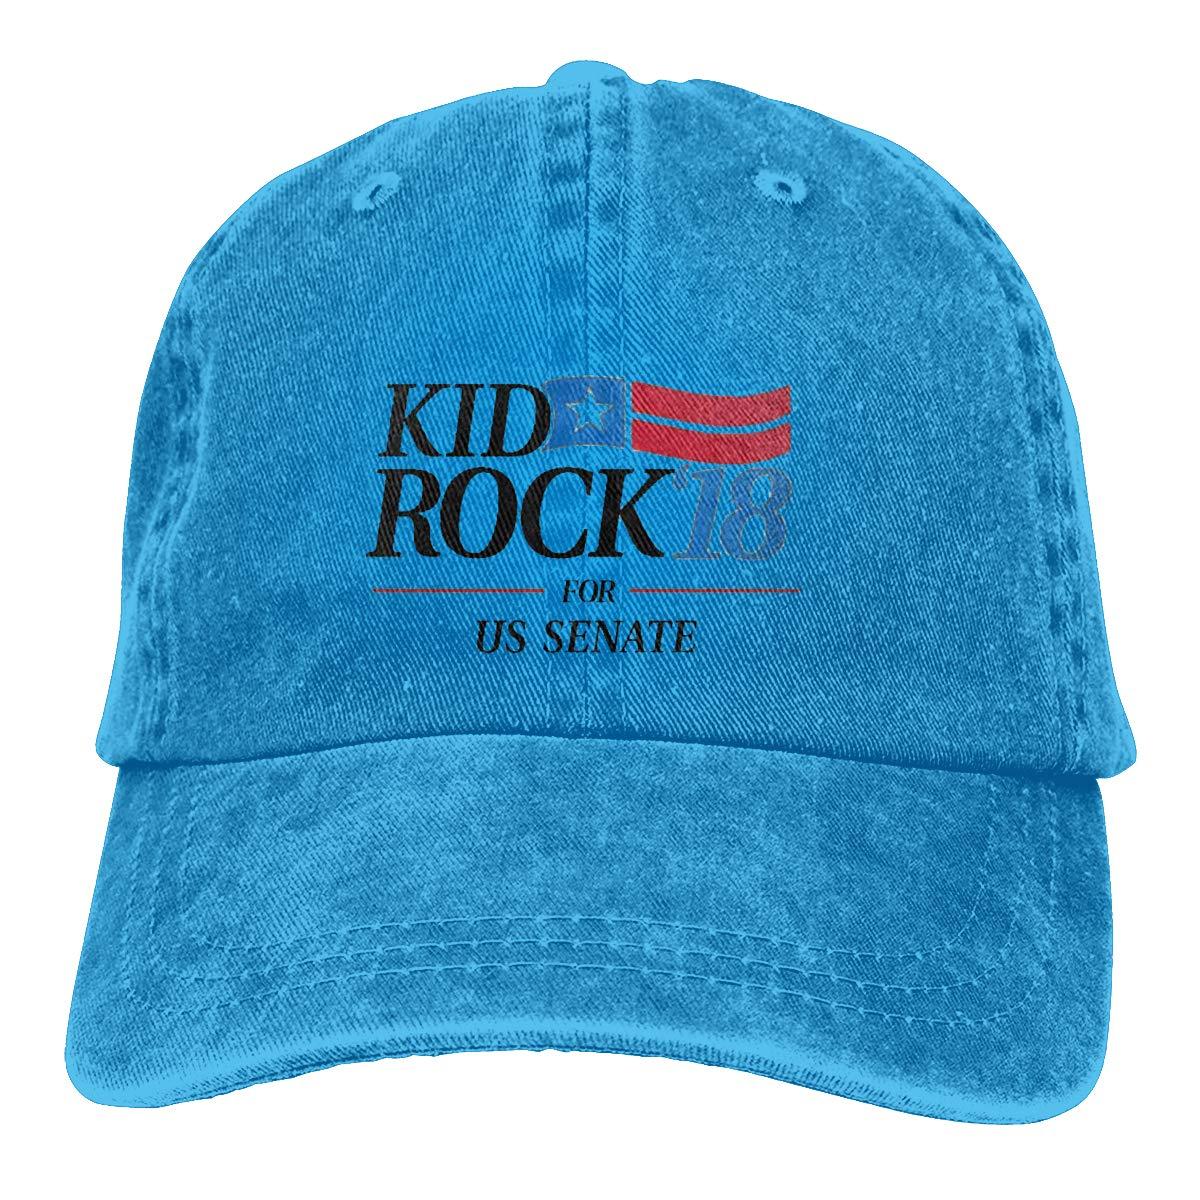 Kid Rock18 for US Senate Unisex Baseball Cap Cotton Denim Stylish Adjustable Sun Hat for Men Women Youth